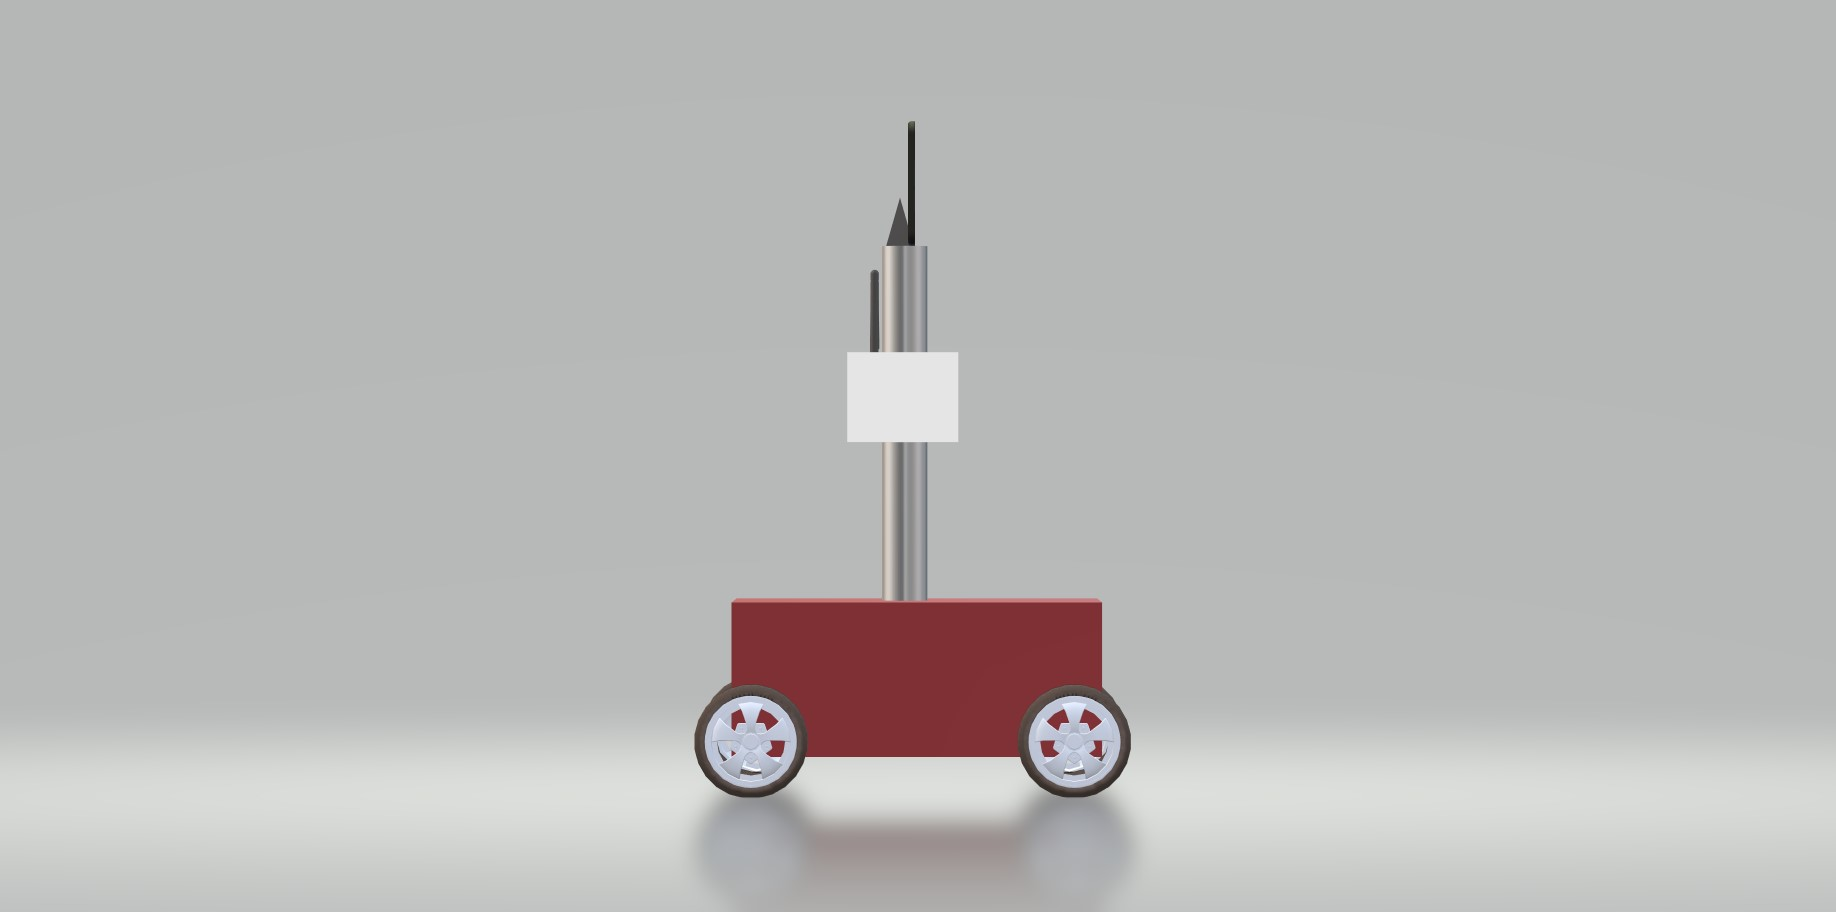 Nevon iot doctor video call robot